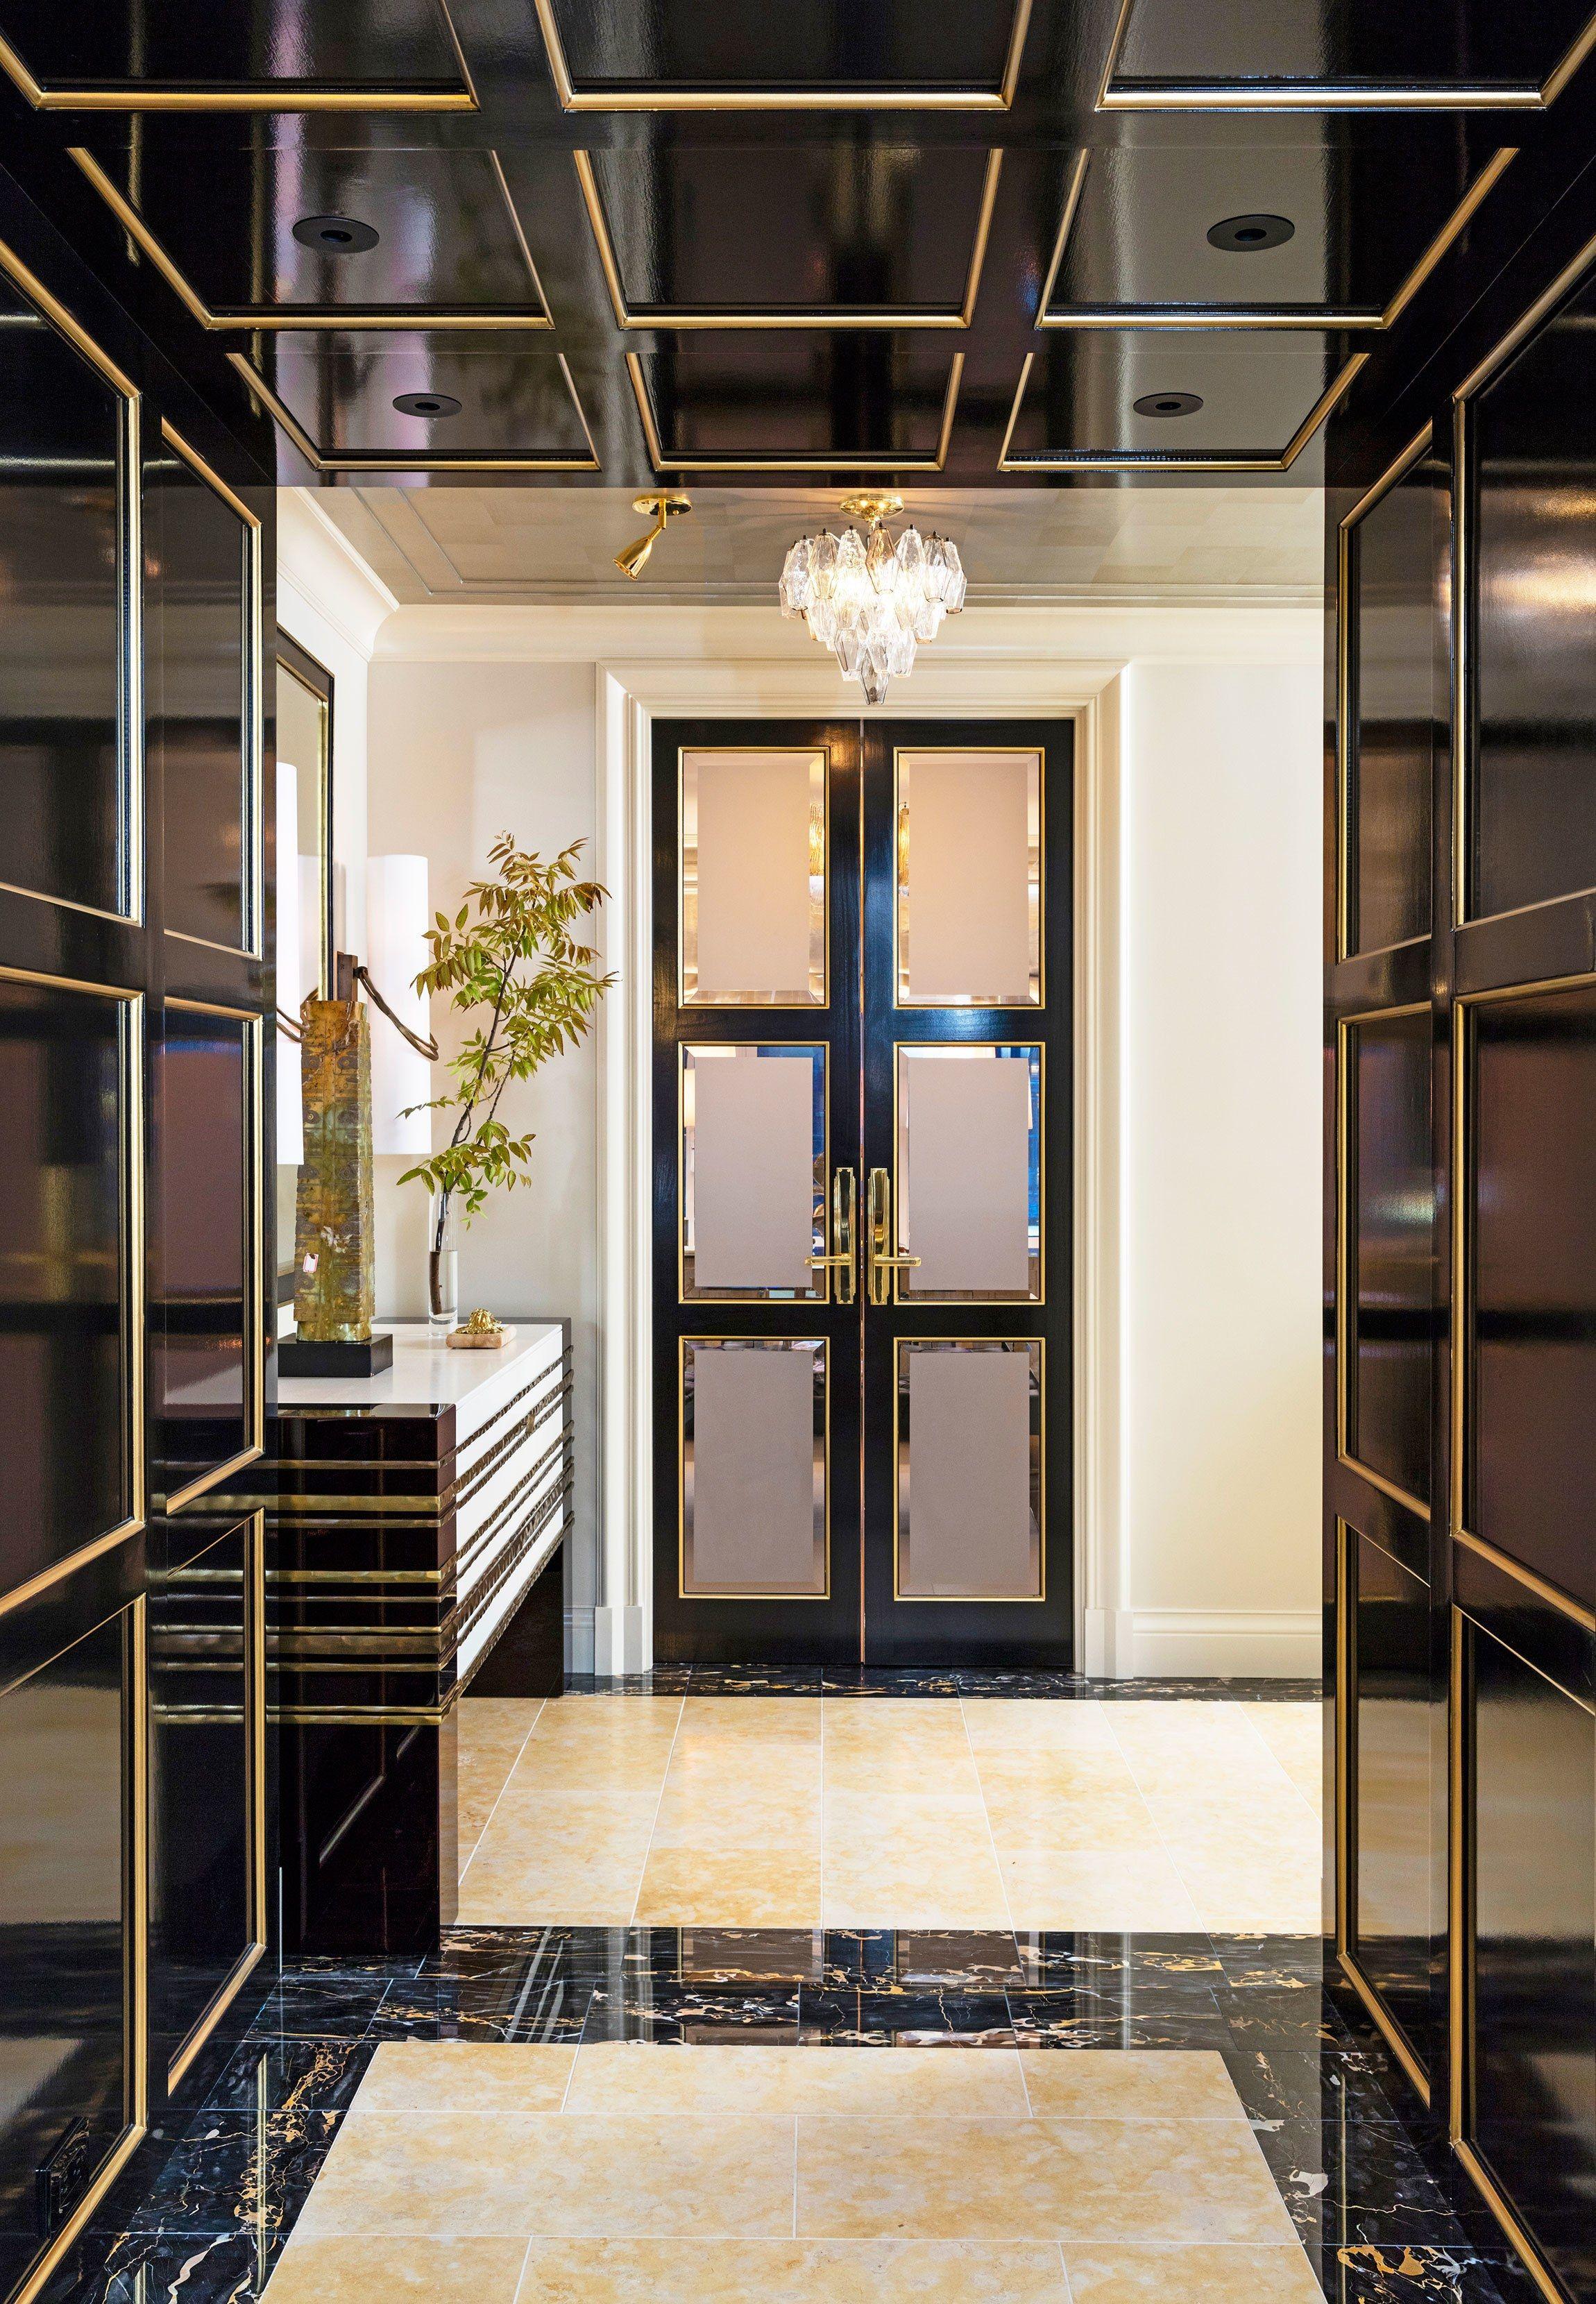 An Elegant New York Apartment with Fashion-Forward Style #hallway